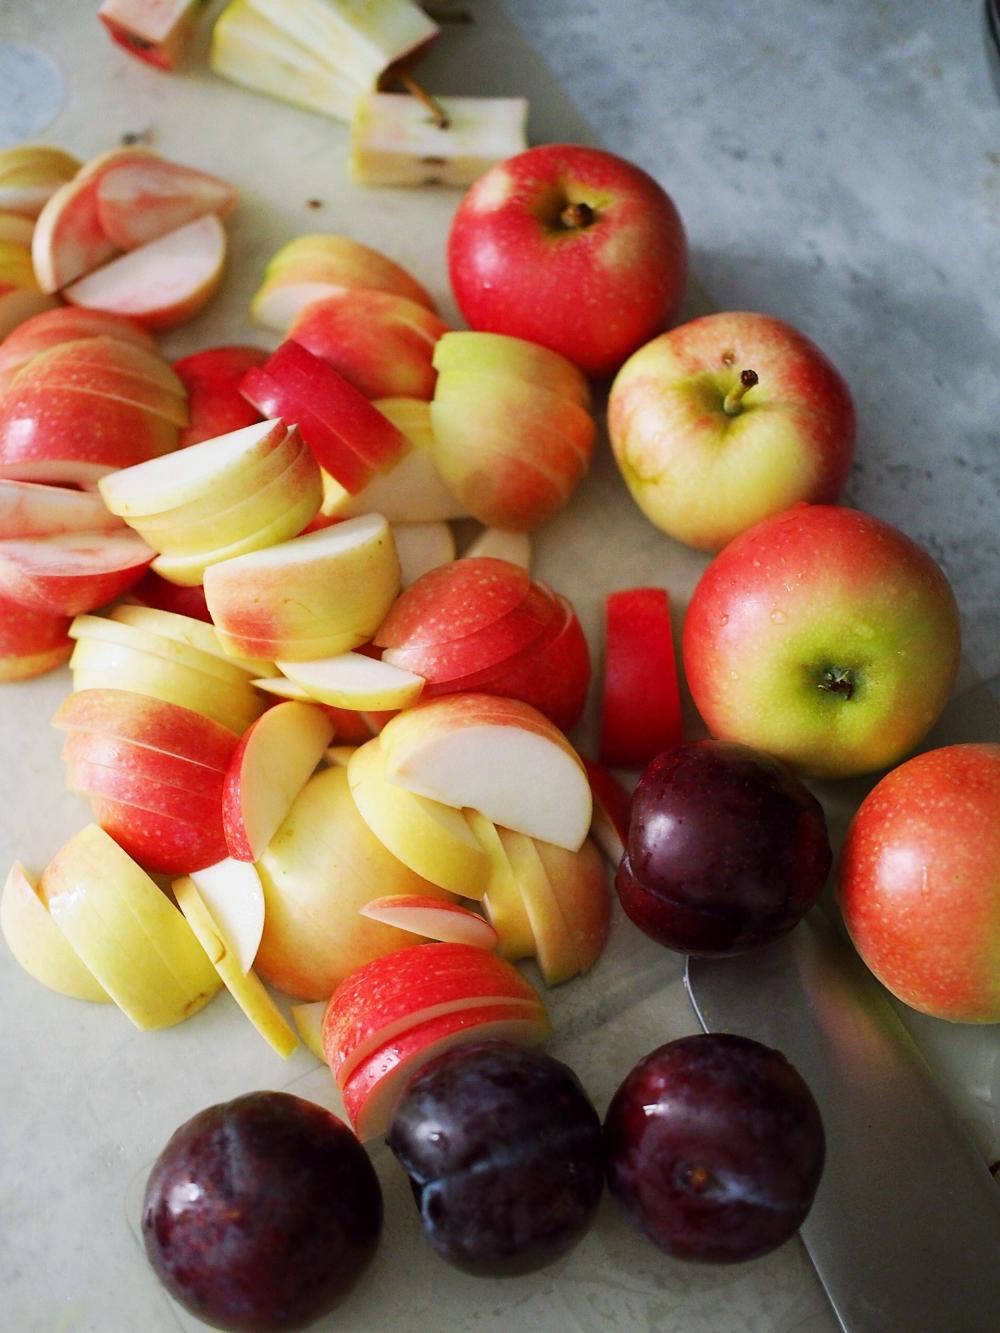 Omenoiden kypsyminen 2018